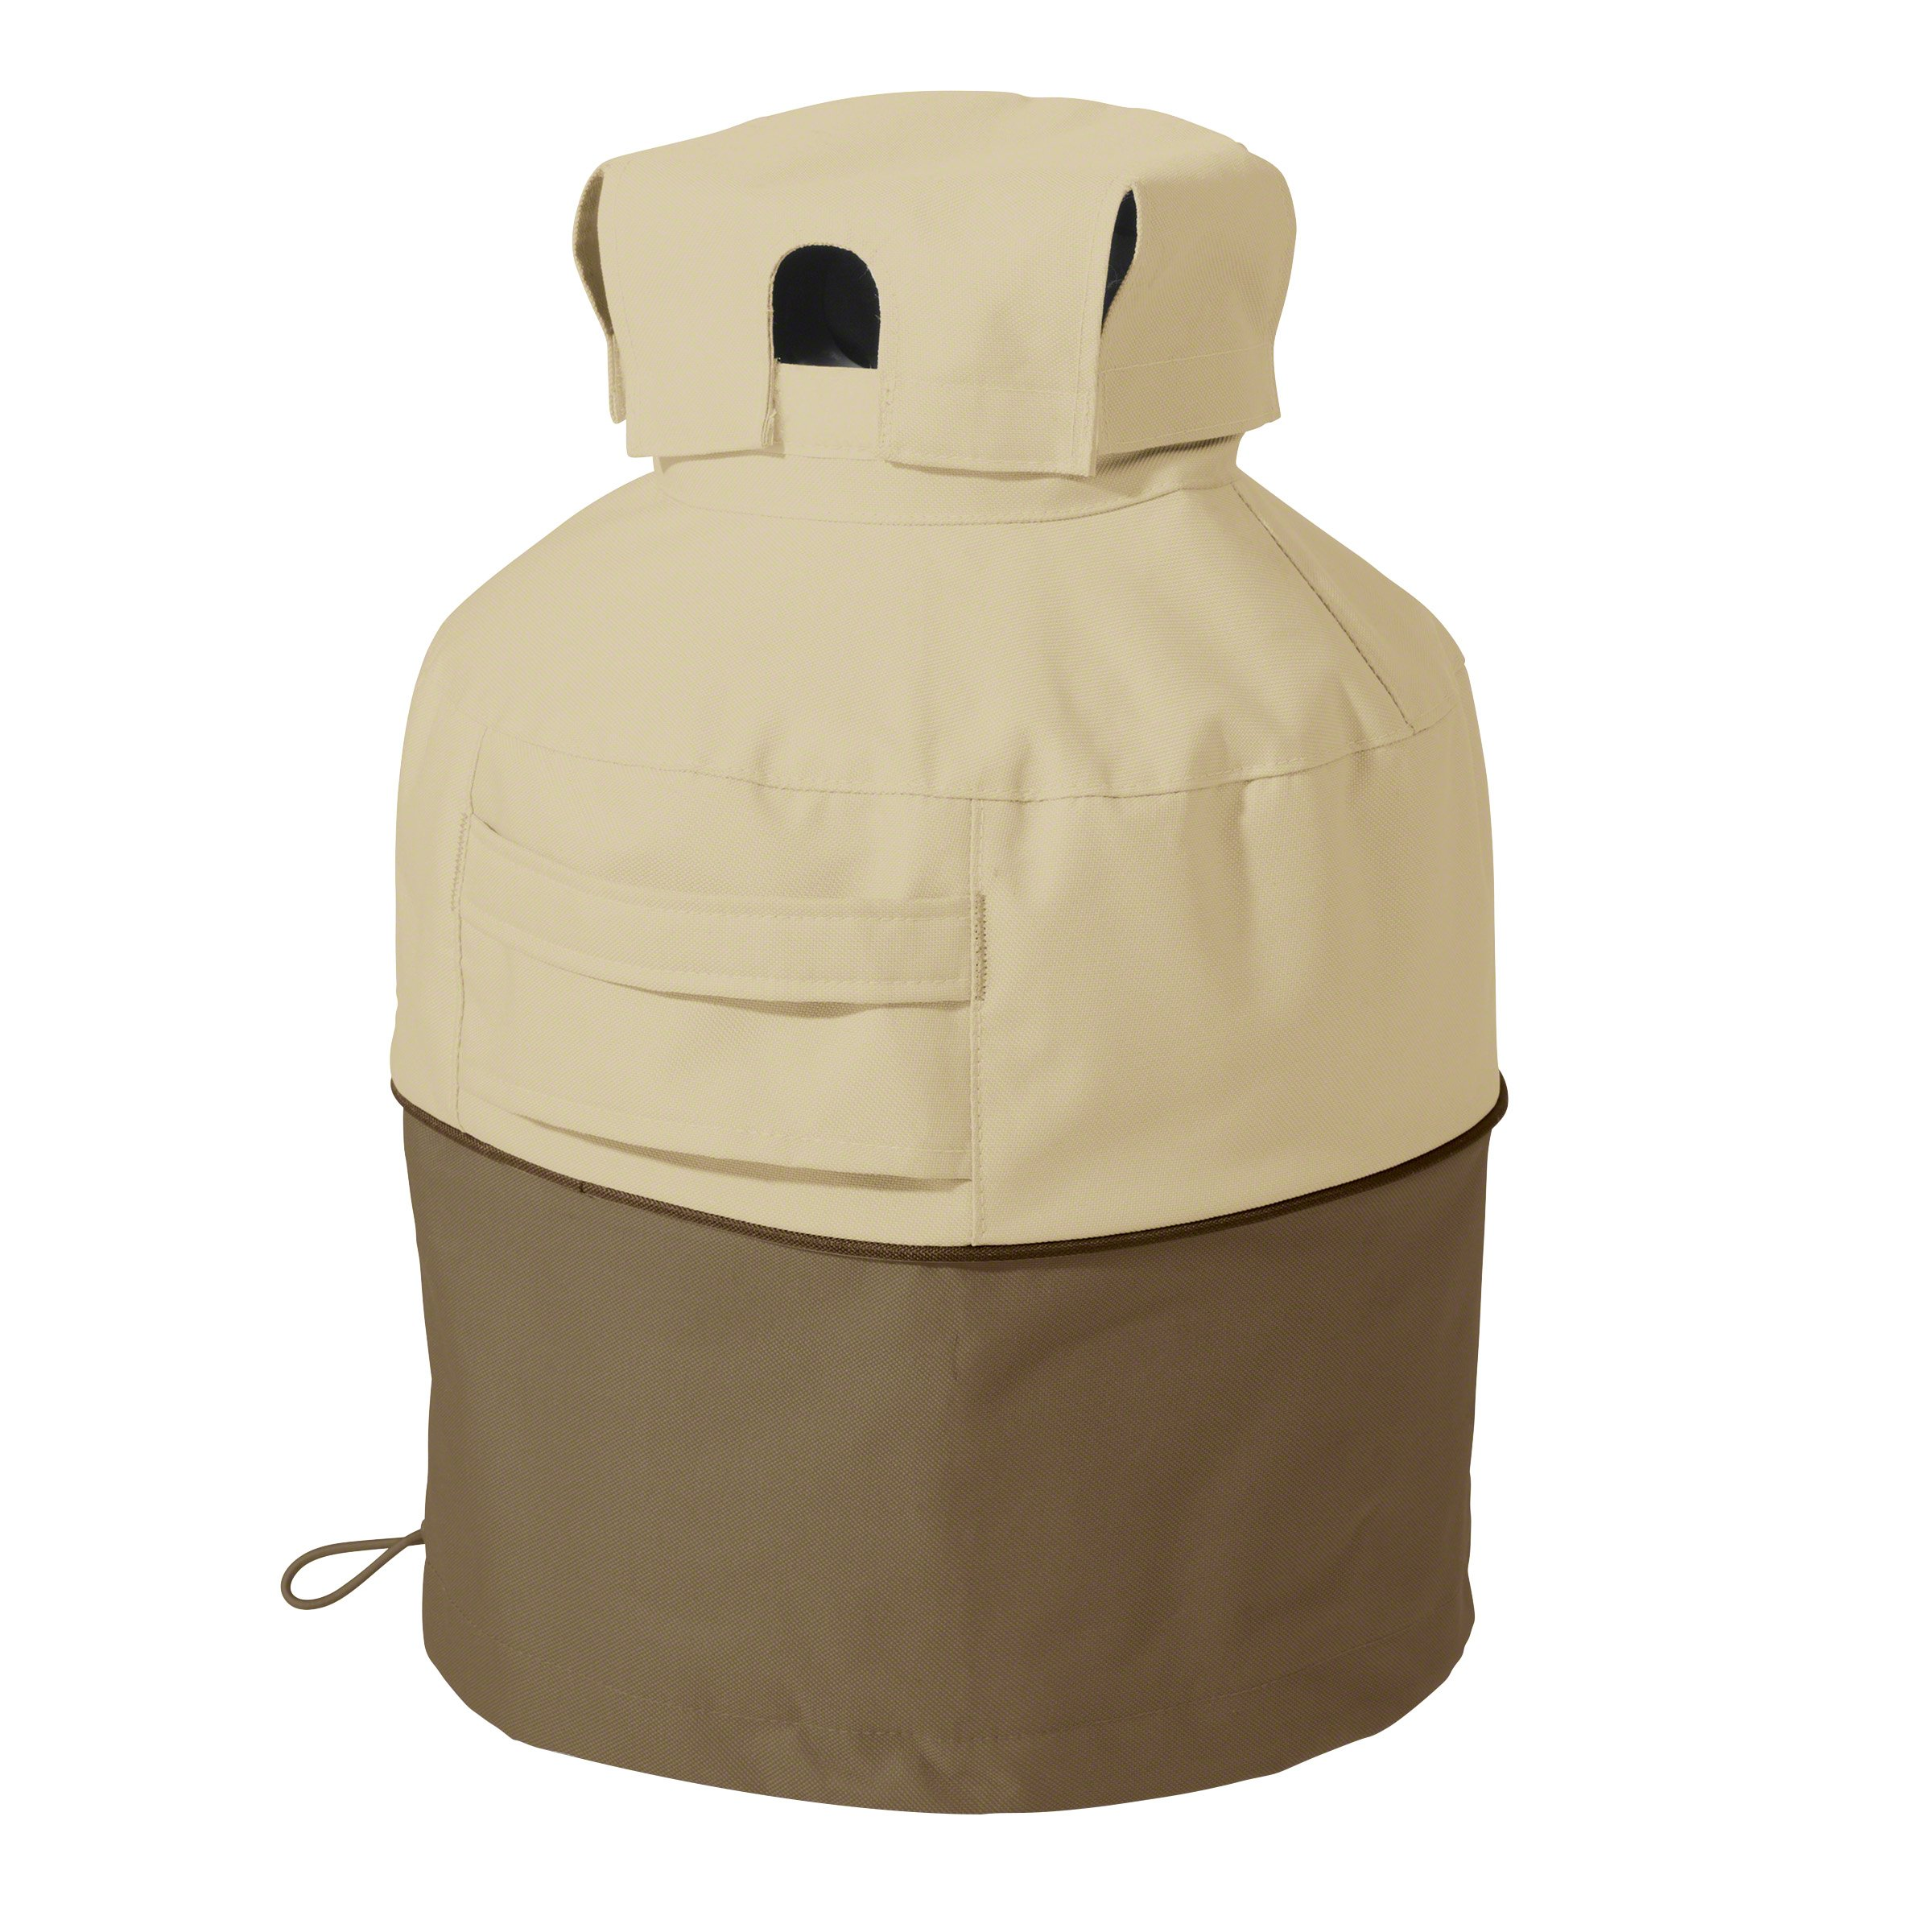 Classic Accessories Veranda Water-Resistant 7 Inch Propane Tank Cover